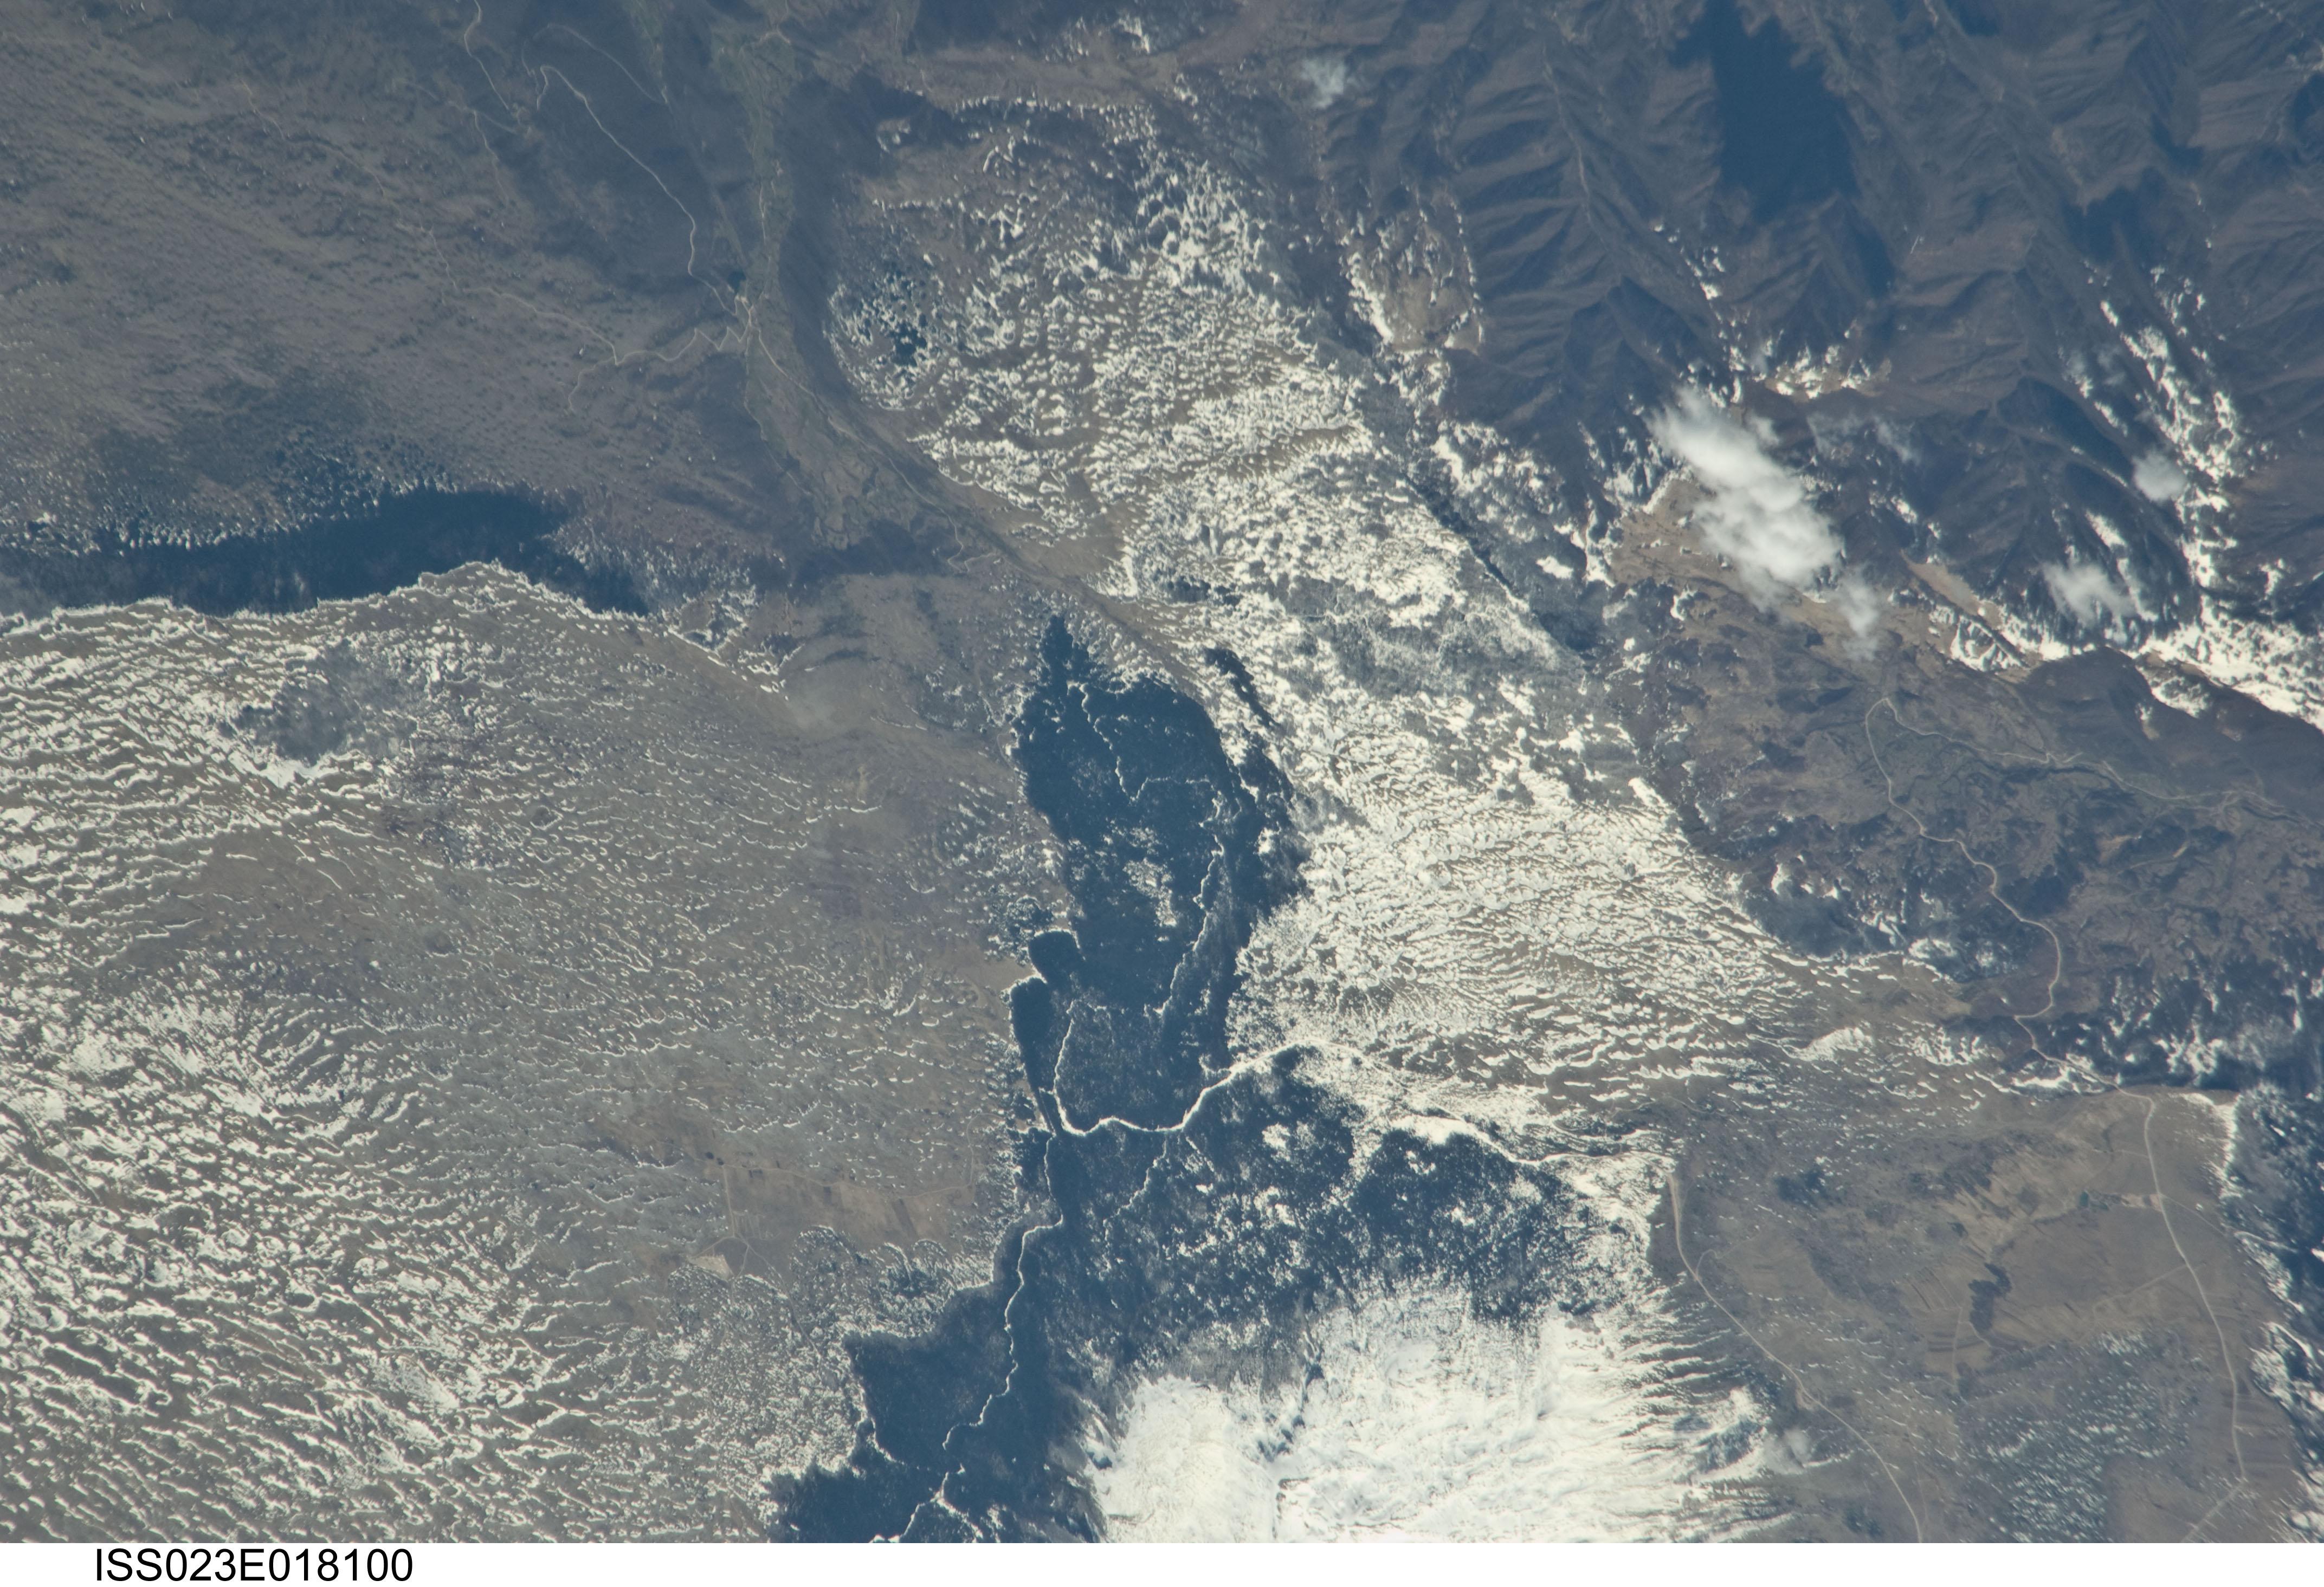 File Vran Planina I Trebi Evo E 18100 Jpg Wikimedia Commons